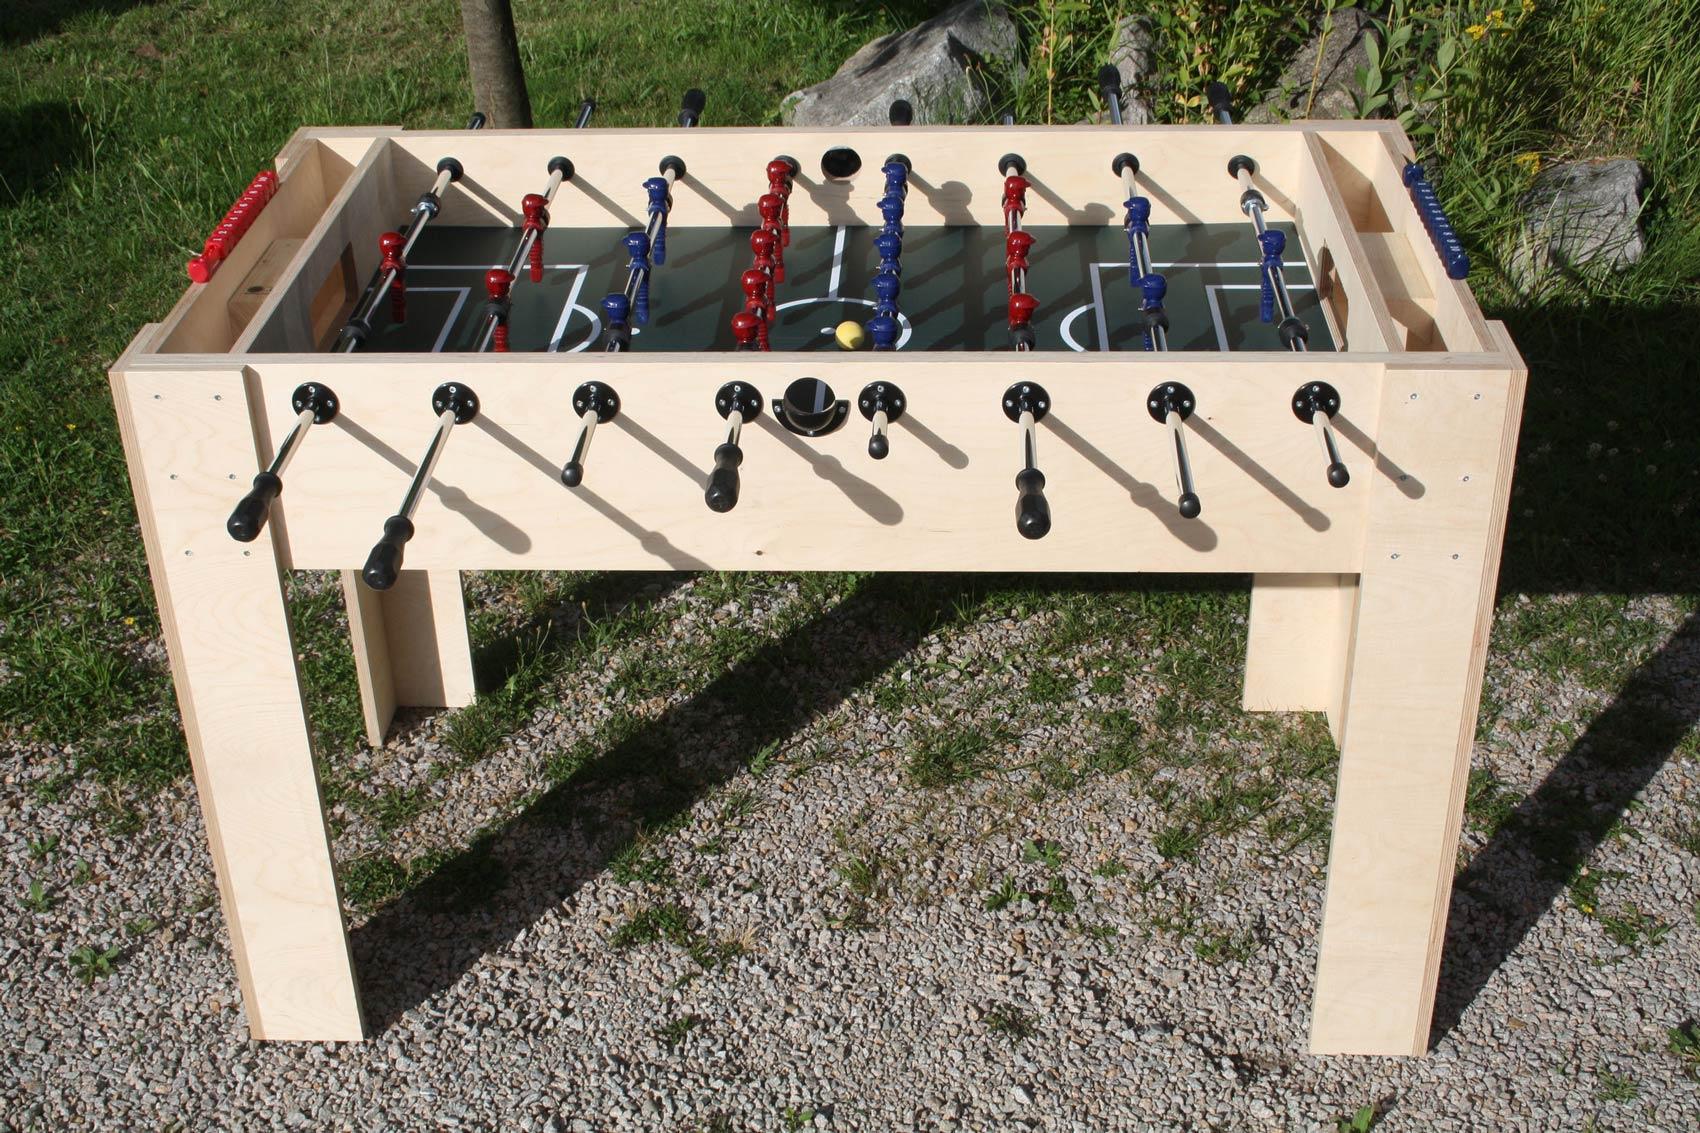 Bausatz: Tischkicker